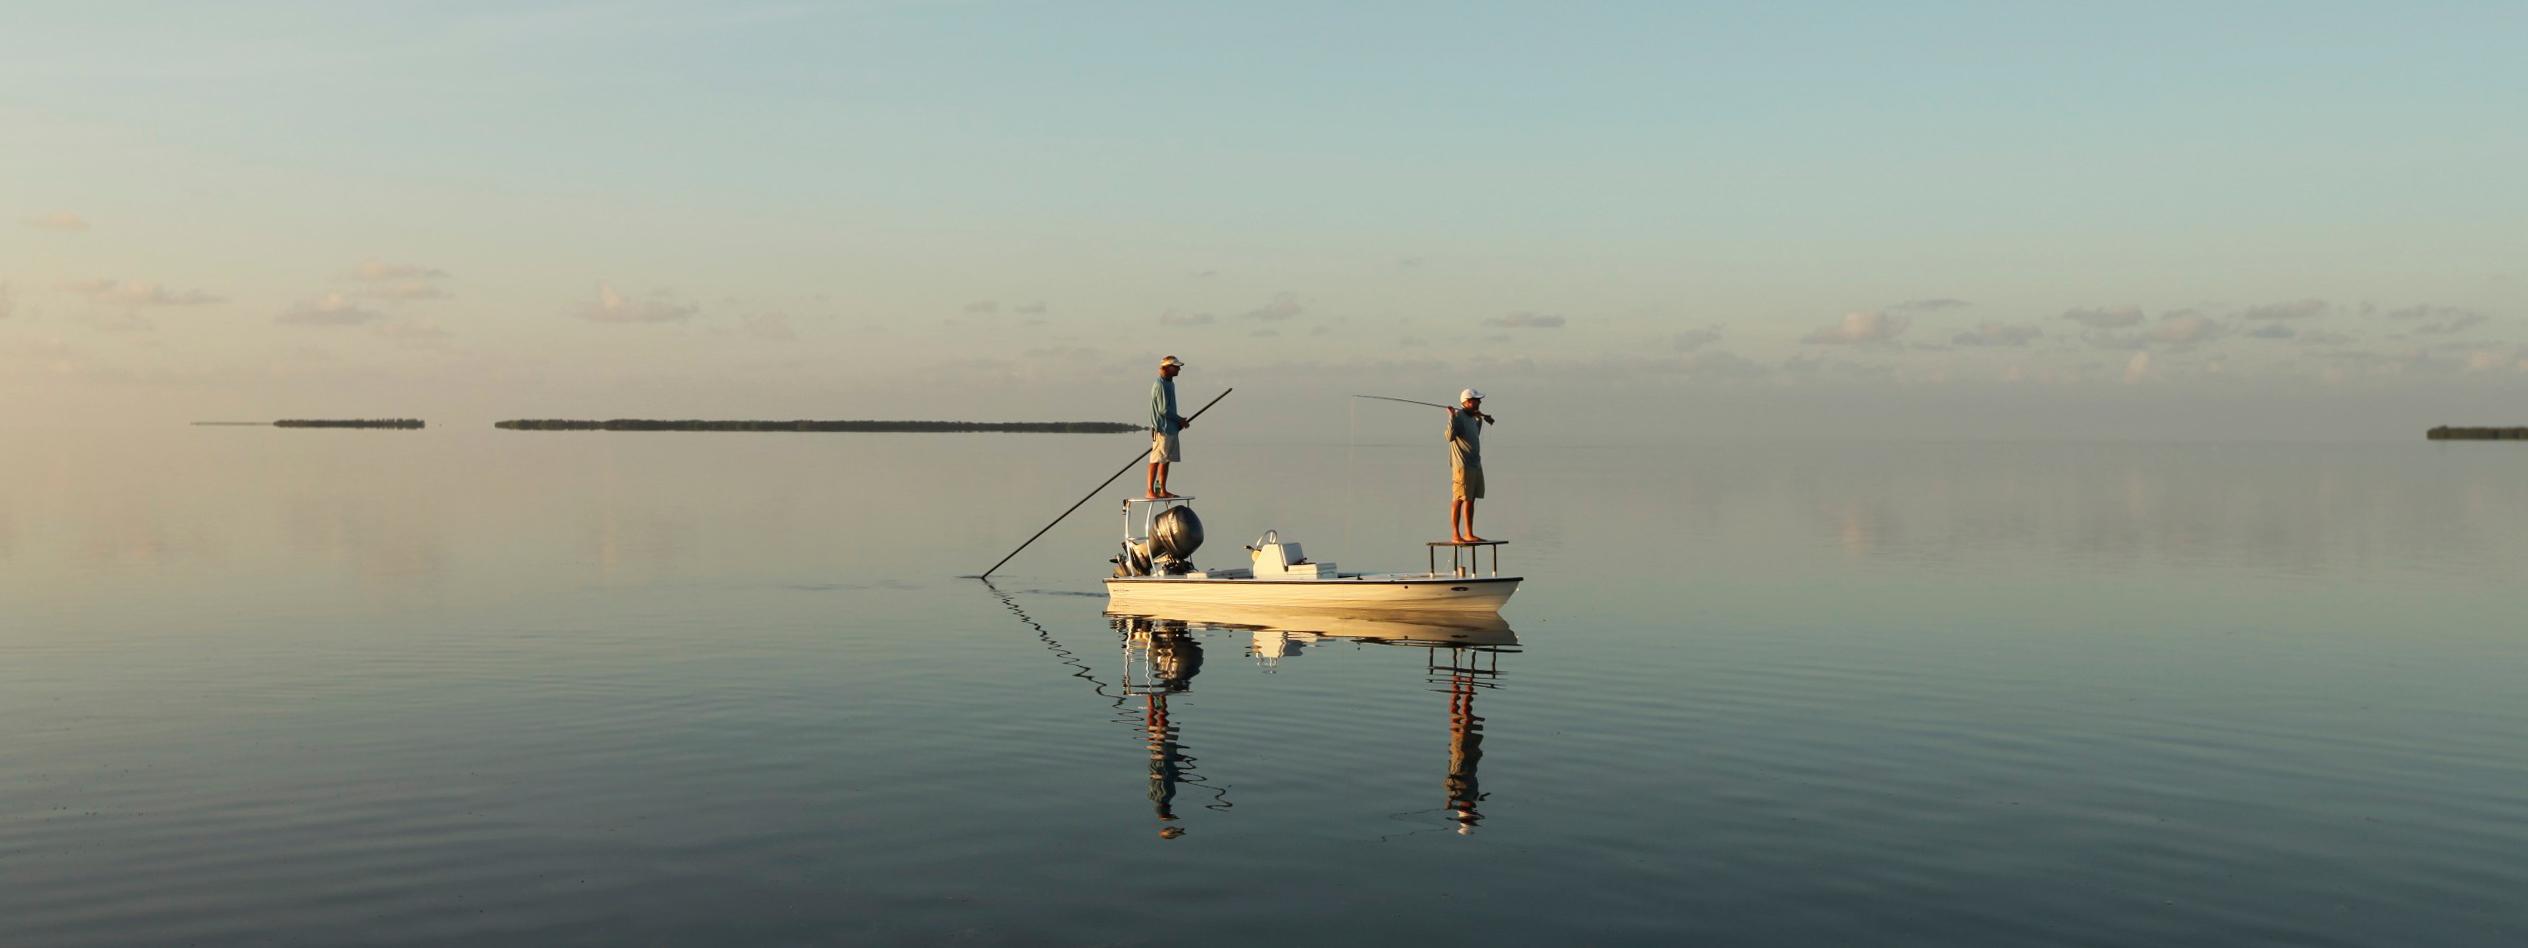 Dawn Patrol fly fishing for tarpon